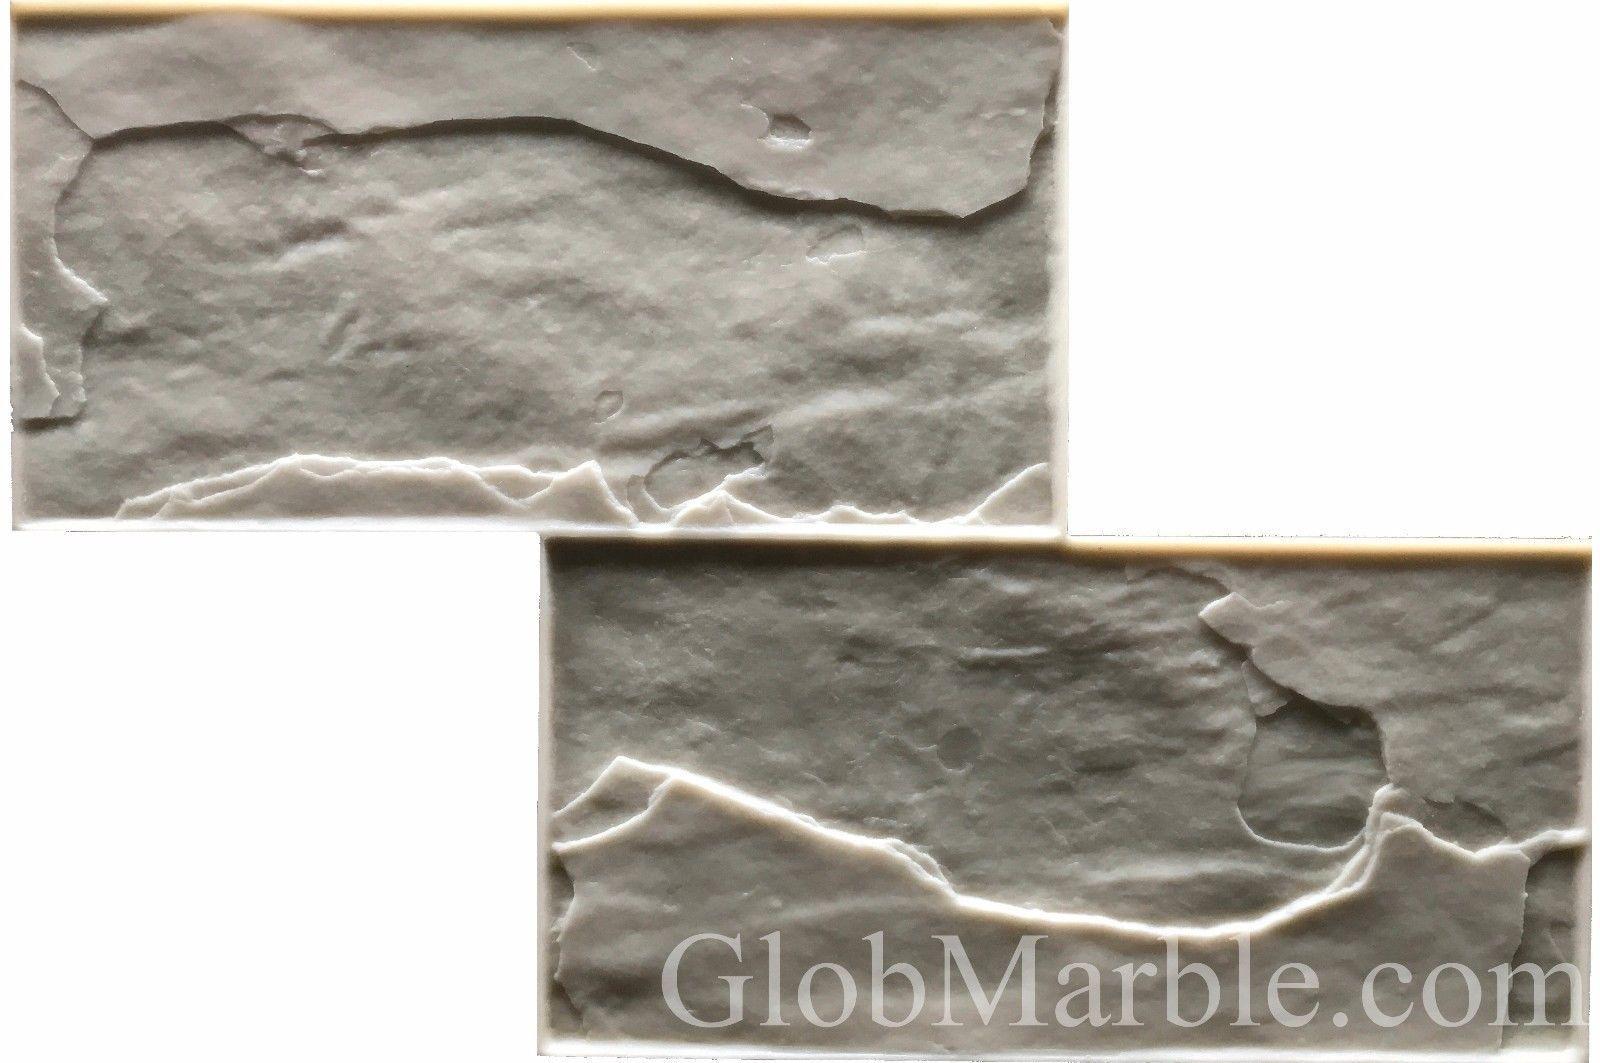 Concrete Stamp Slate Ashlar Concrete Stamp Flex Stamp Floppy Mat SM 2301/F